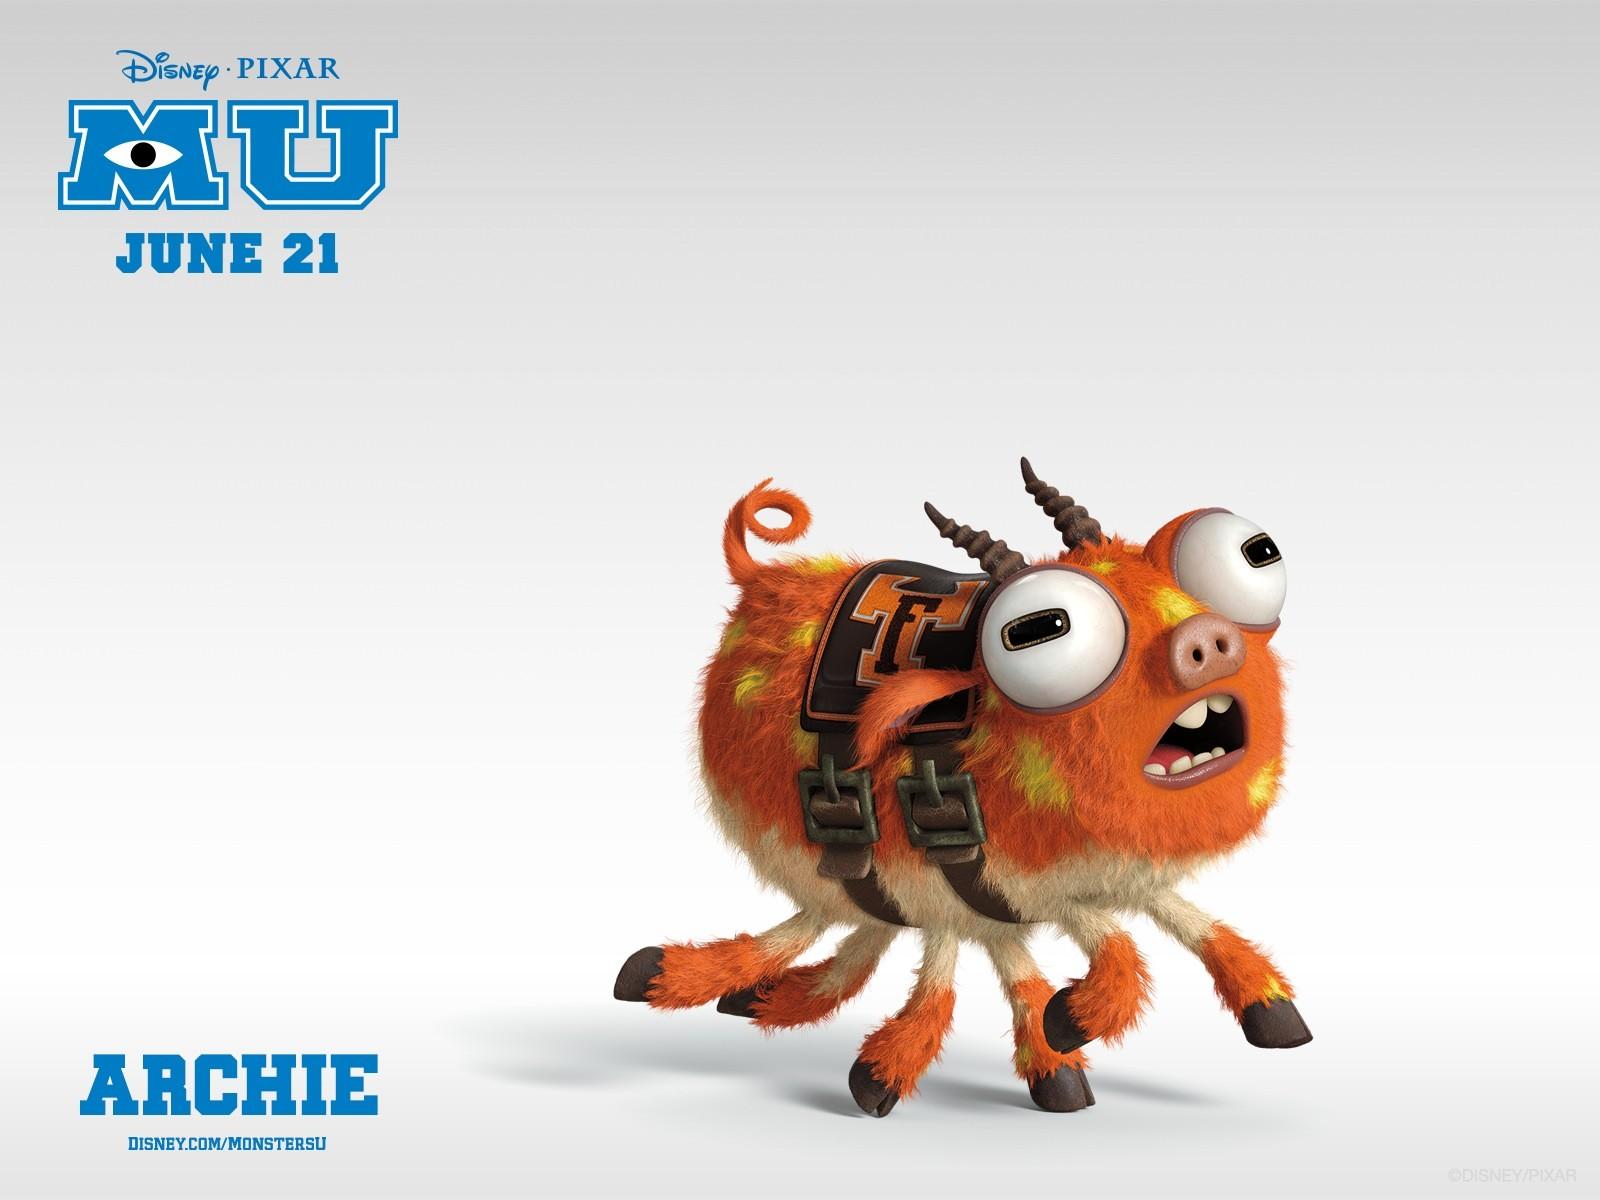 Archie monsters university hd wallpaper archie monsters university hd wallpaper download wallpaper voltagebd Images